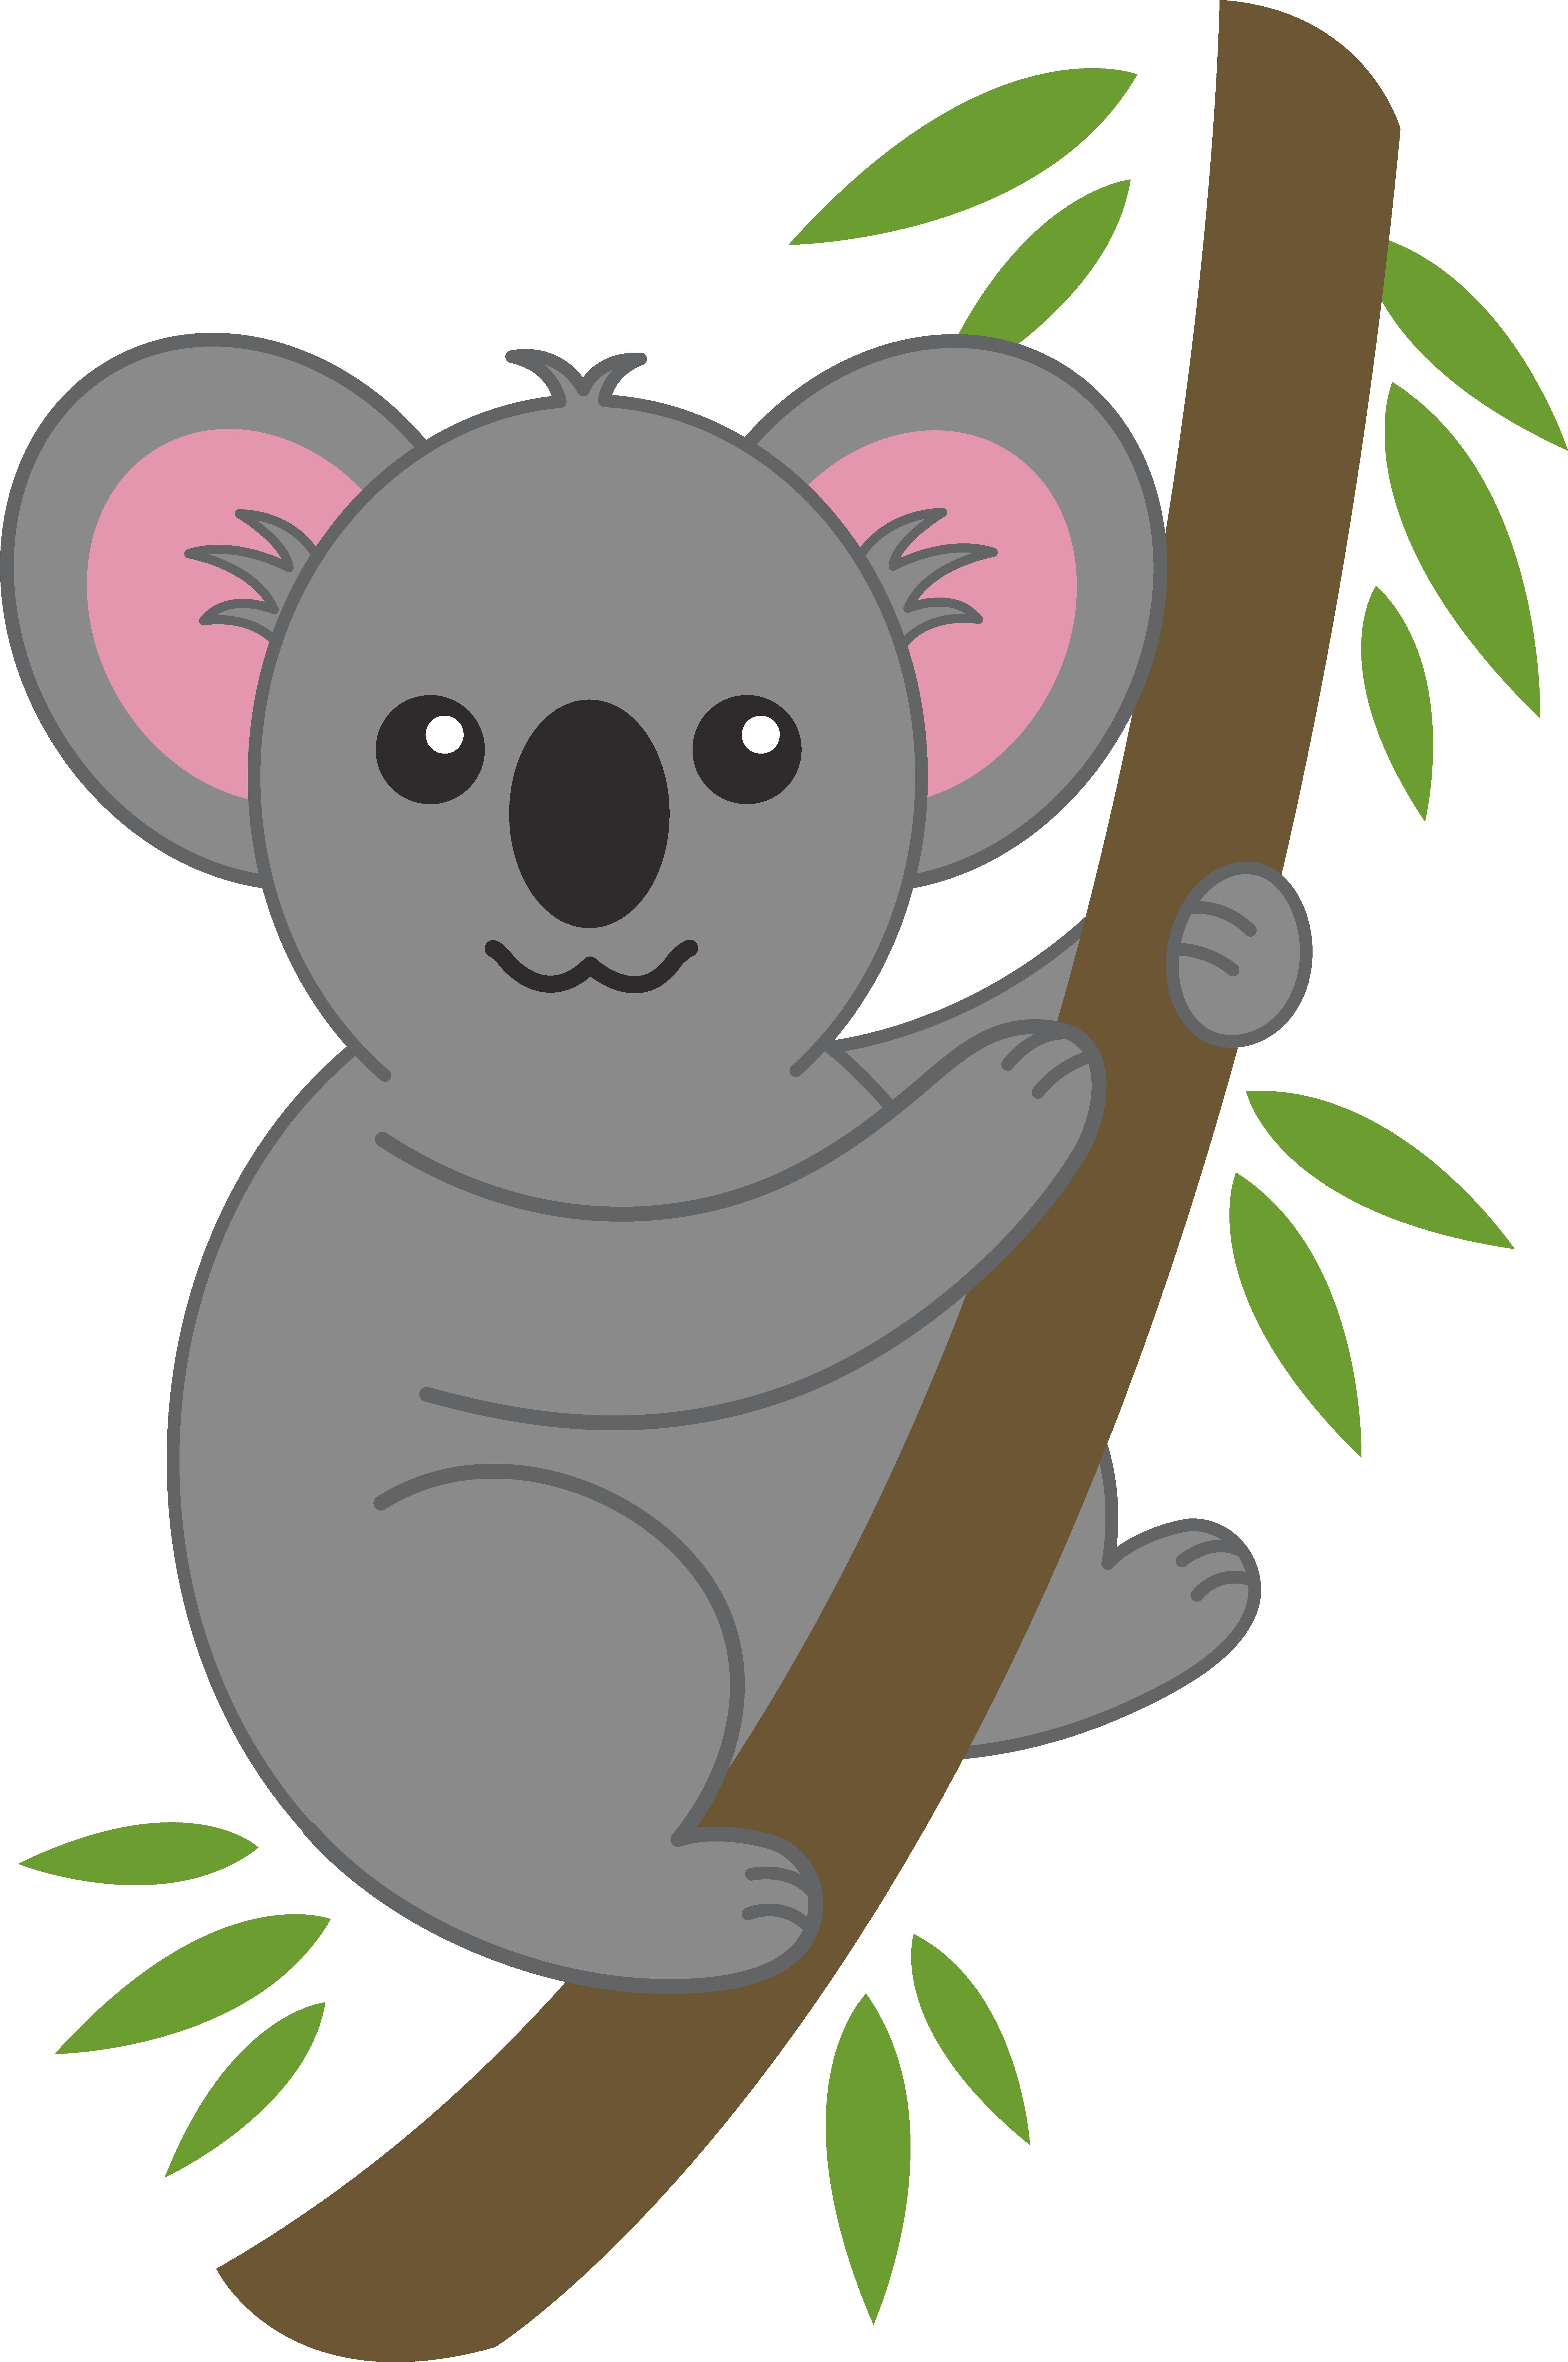 Koala Illustration - Cliparts.co